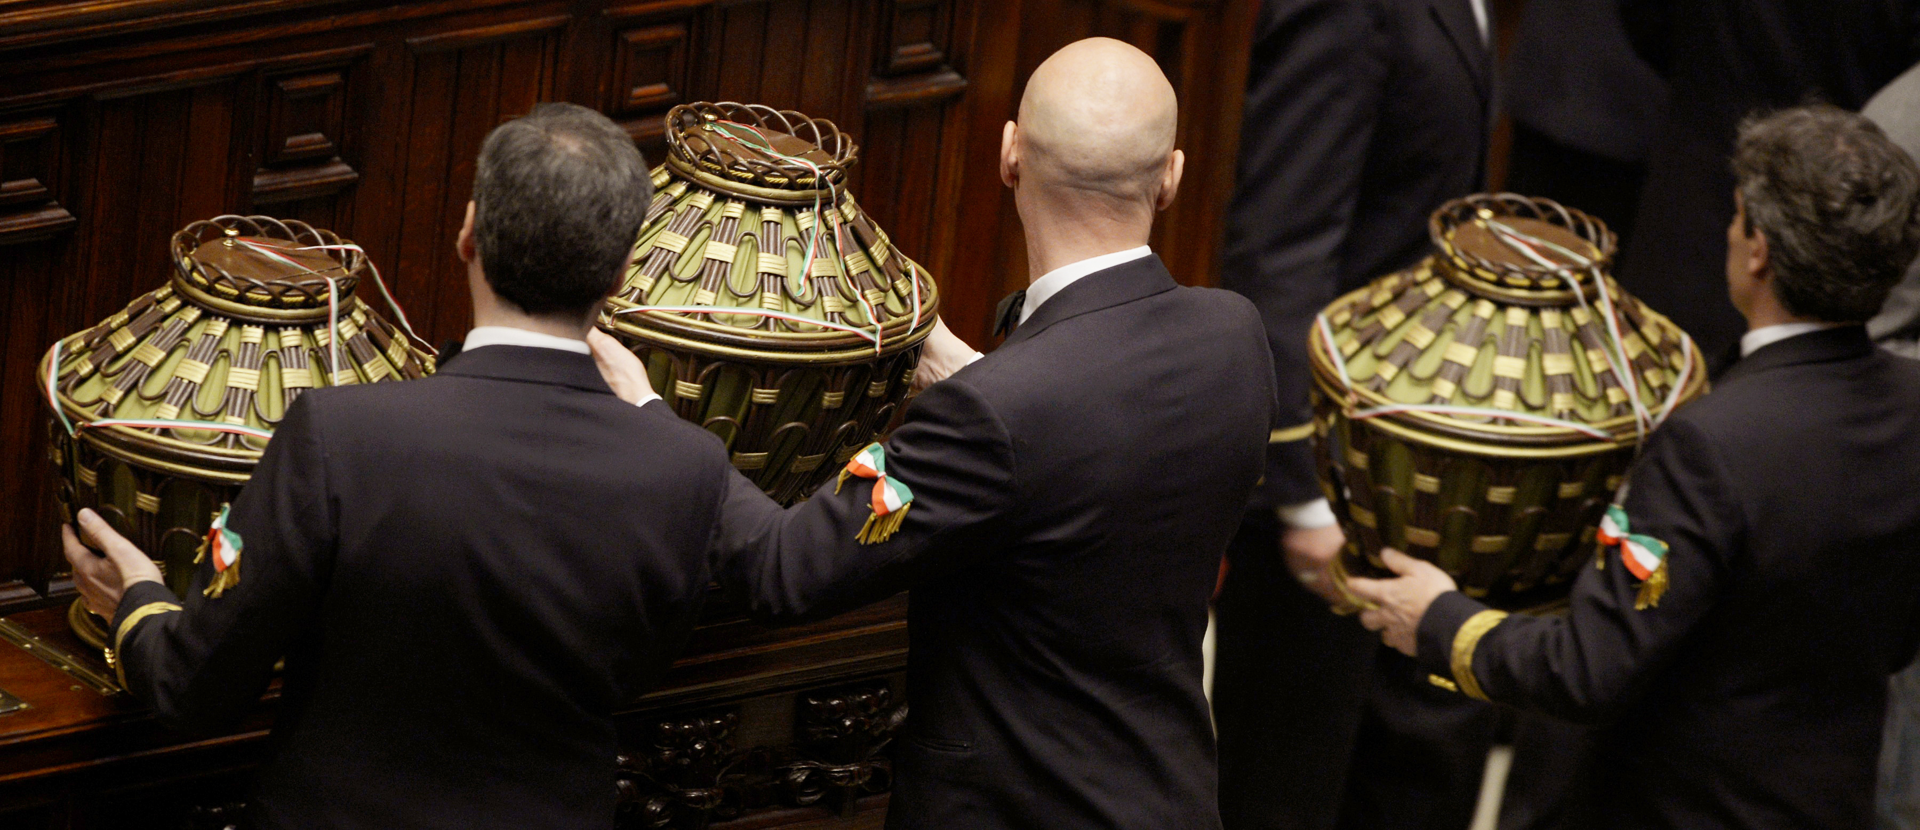 componenti camera dei deputati riforma costituzionale passa referendum ad ottobre wsi